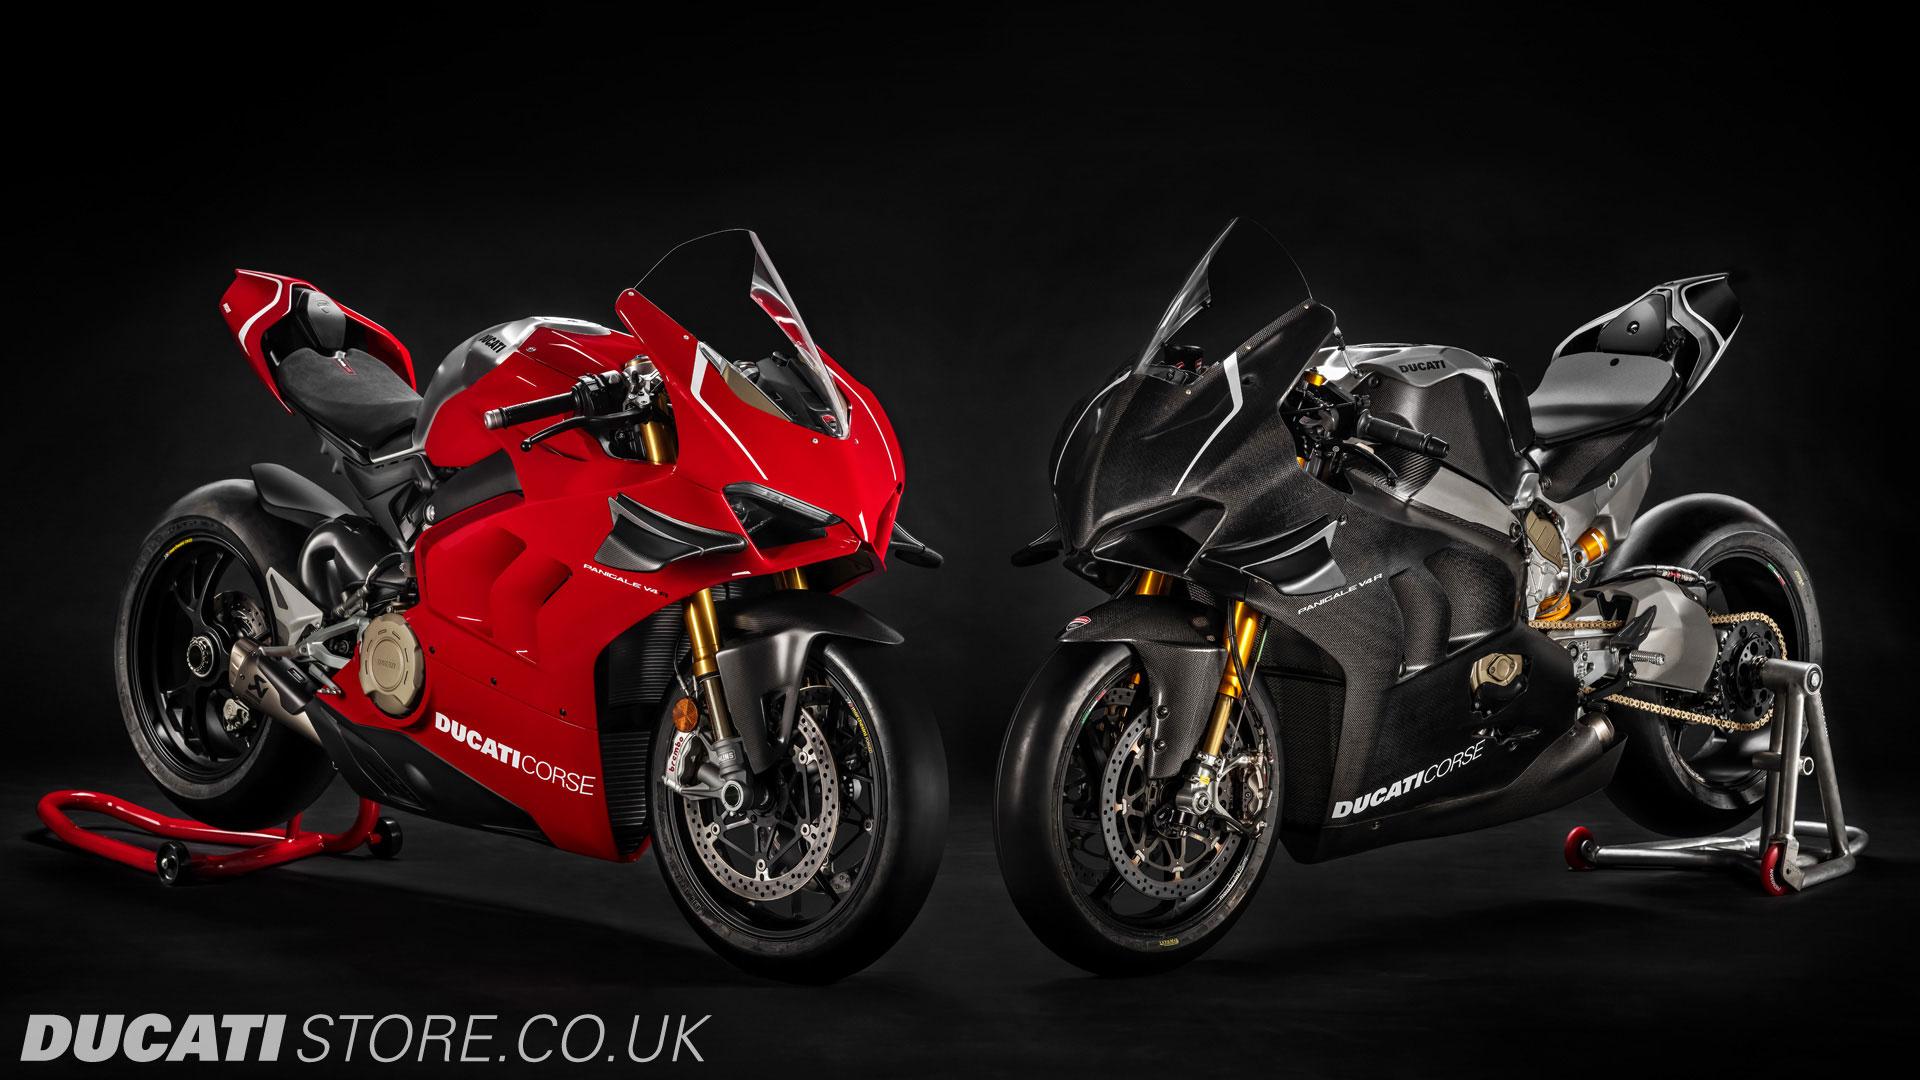 Ducati Panigale V4R for Sale UK - Ducati Manchester